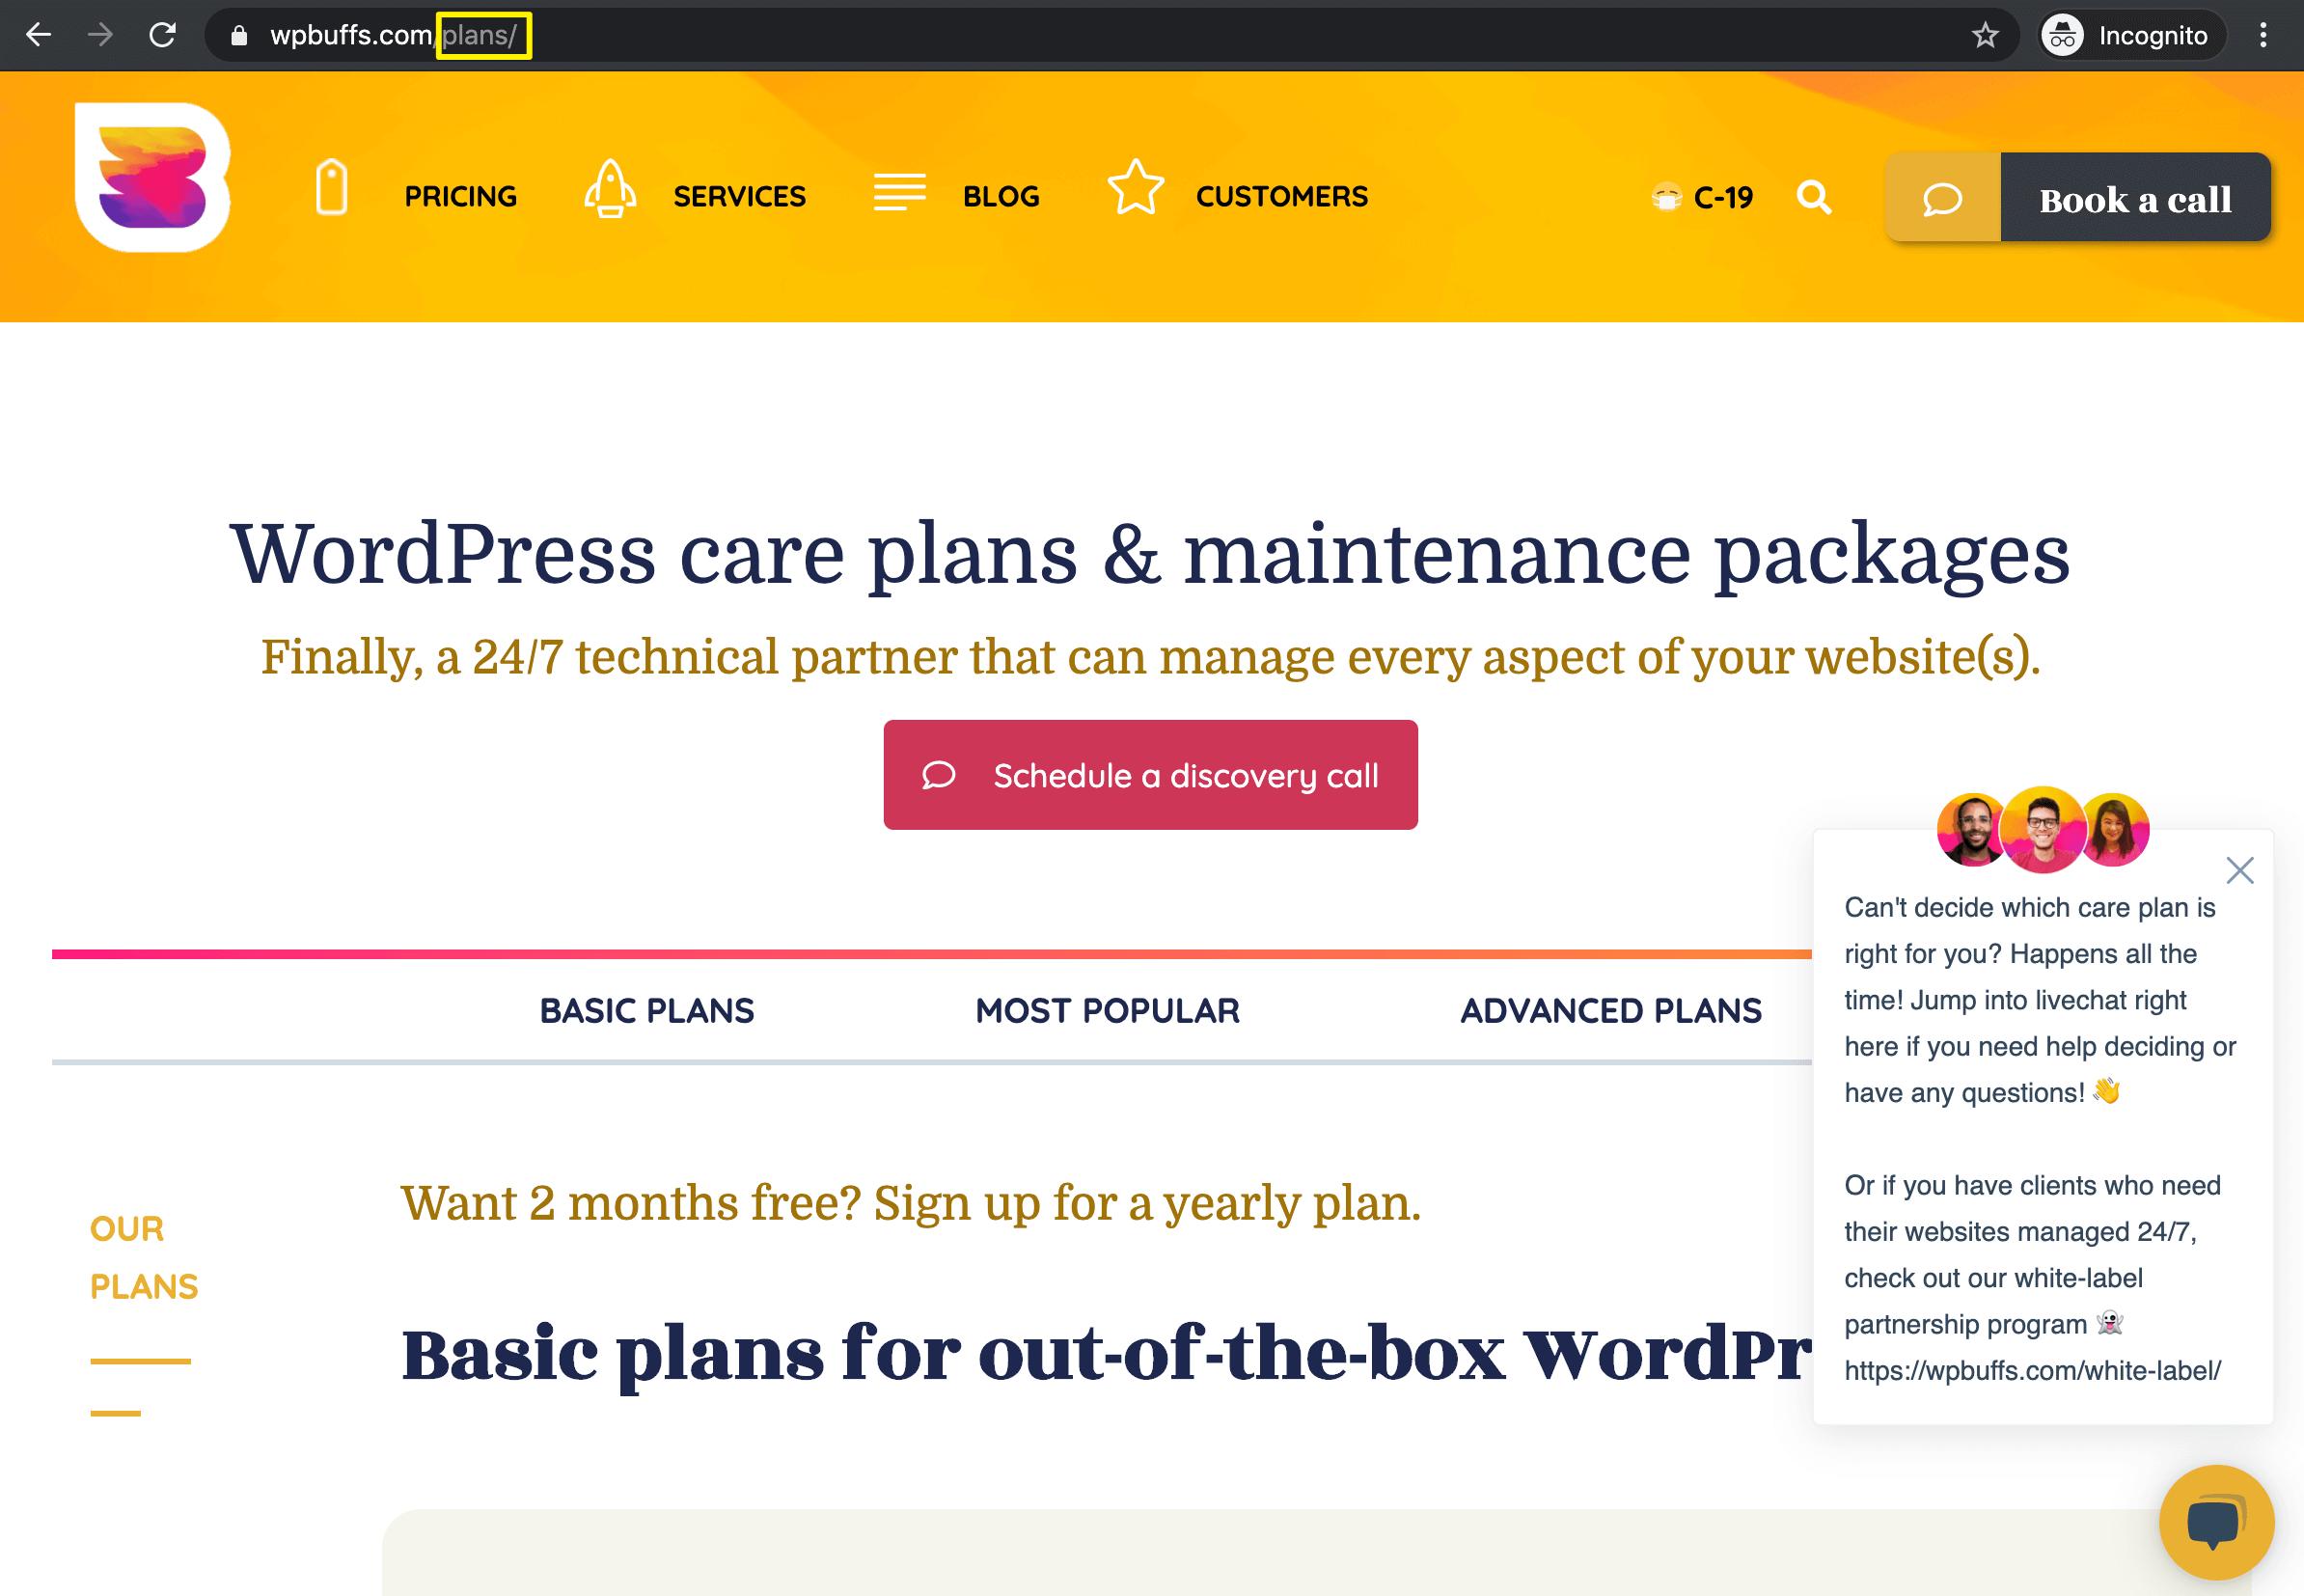 What is WordPress slug used for?